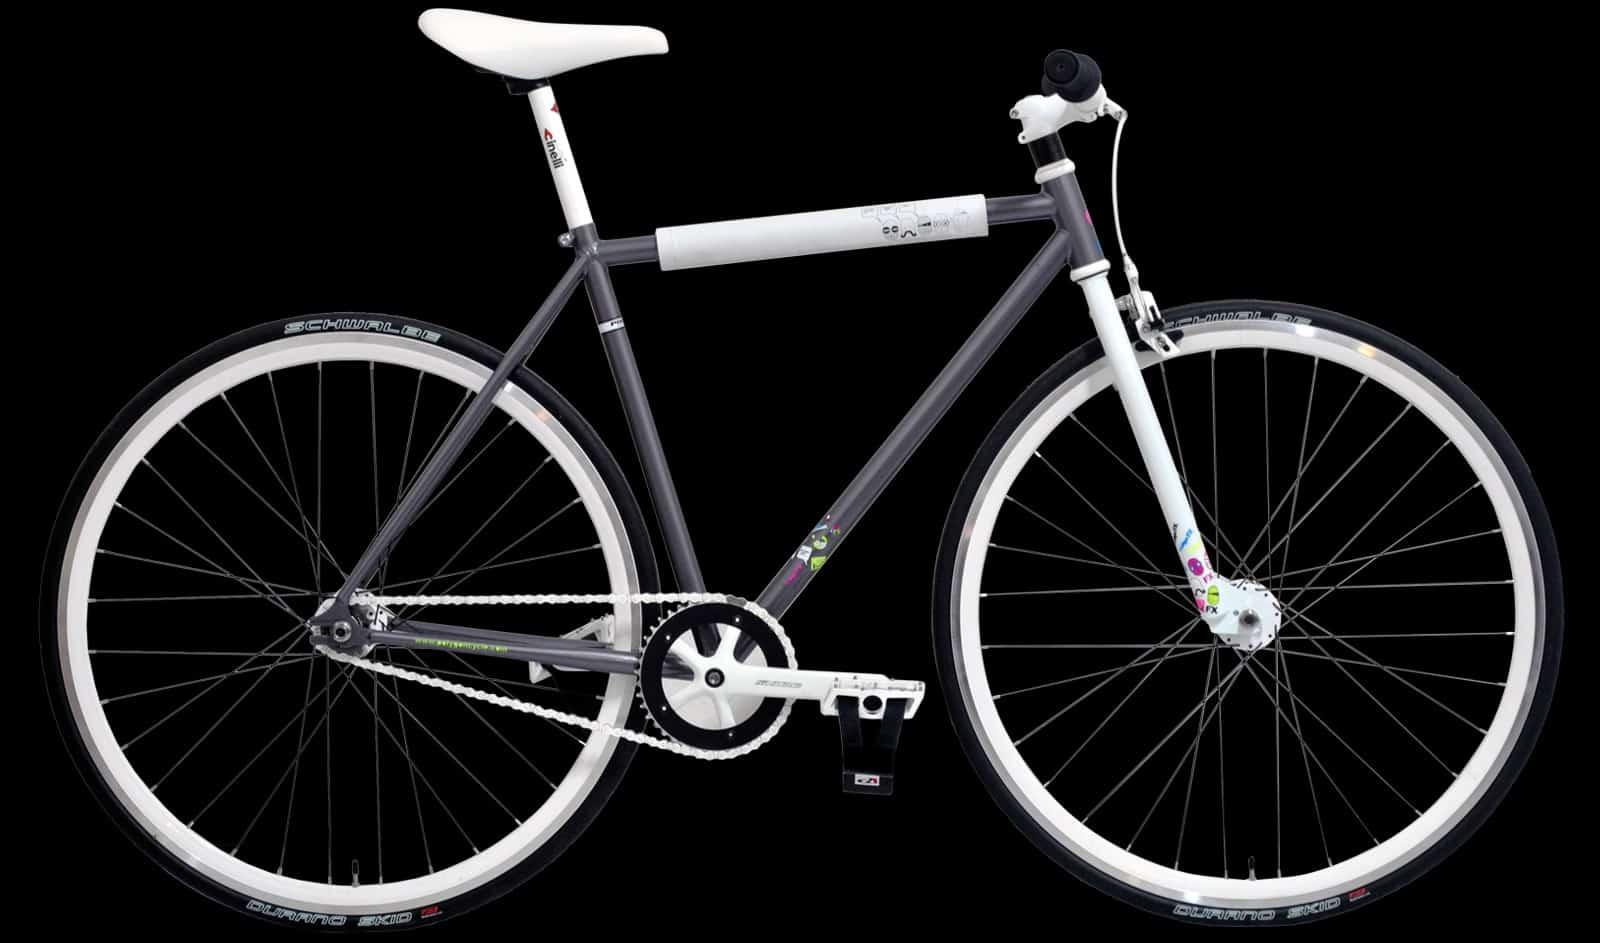 7 Merk Sepeda Fixie yang Paling Bagus dan Terkenal